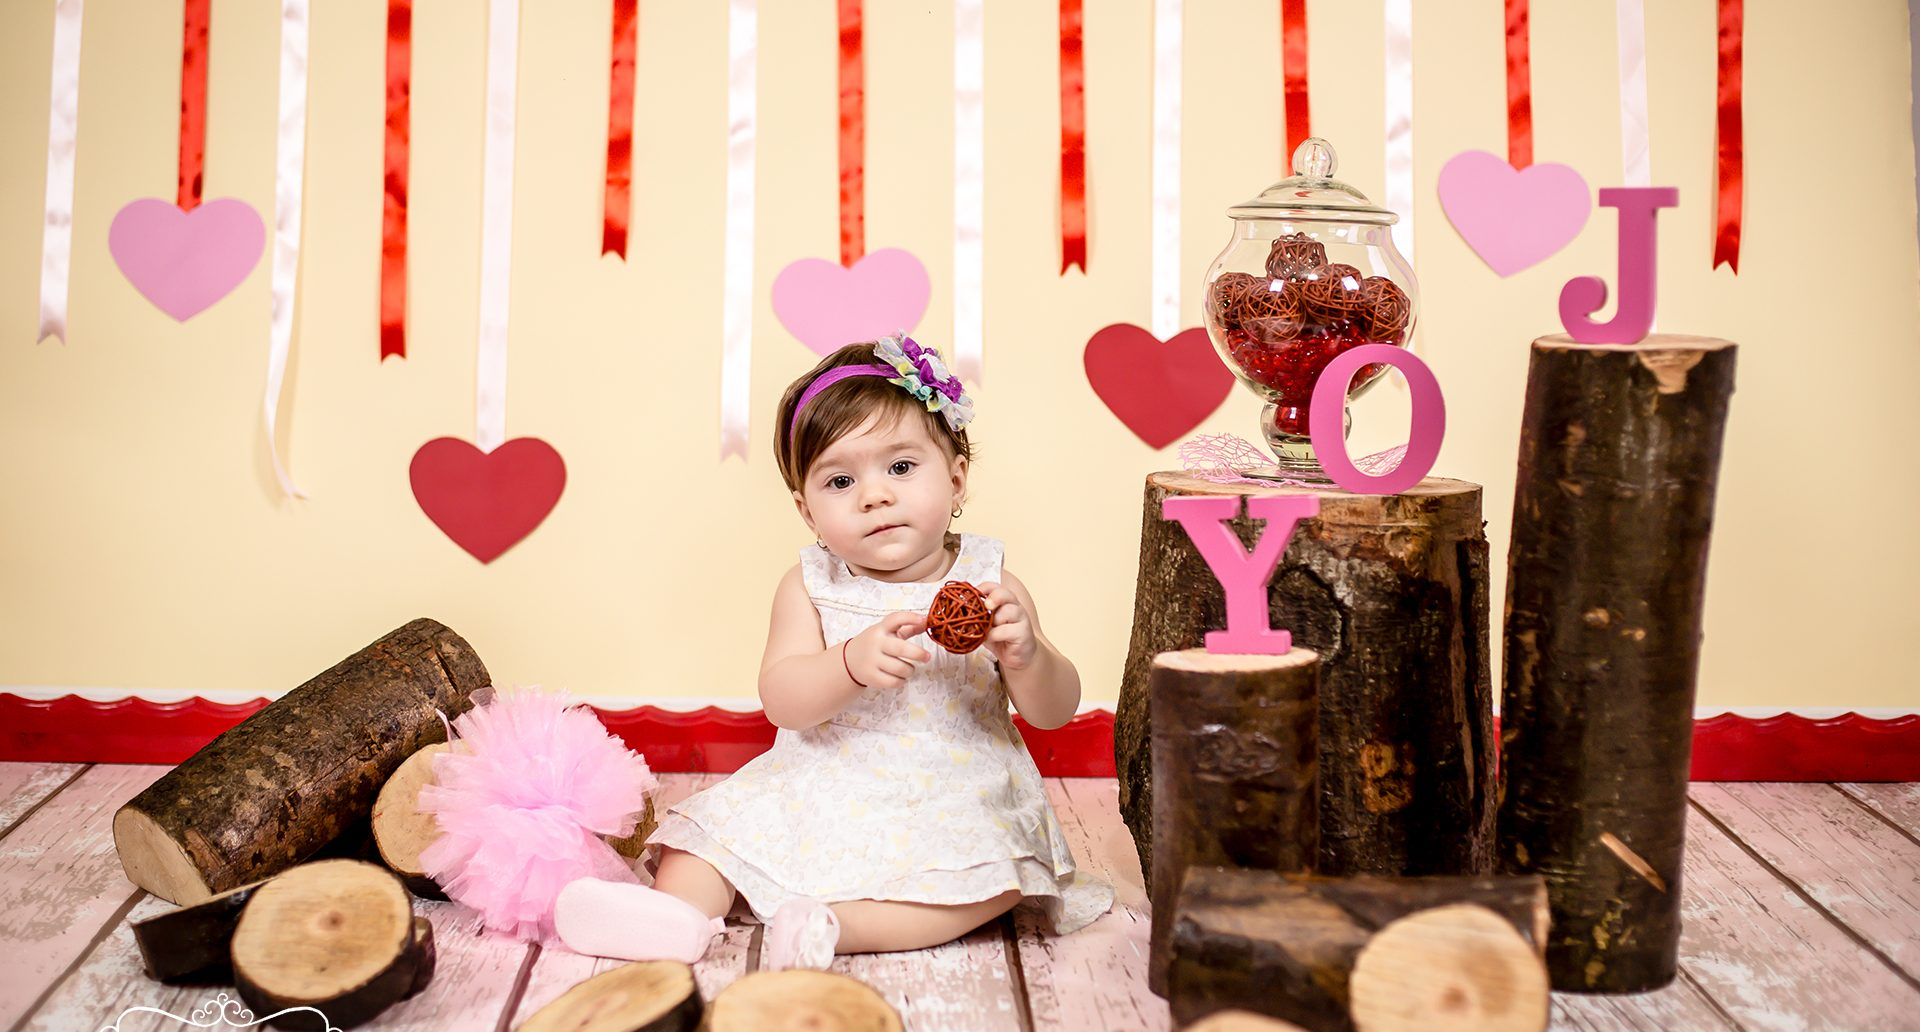 sedinte foto valentine's day 7